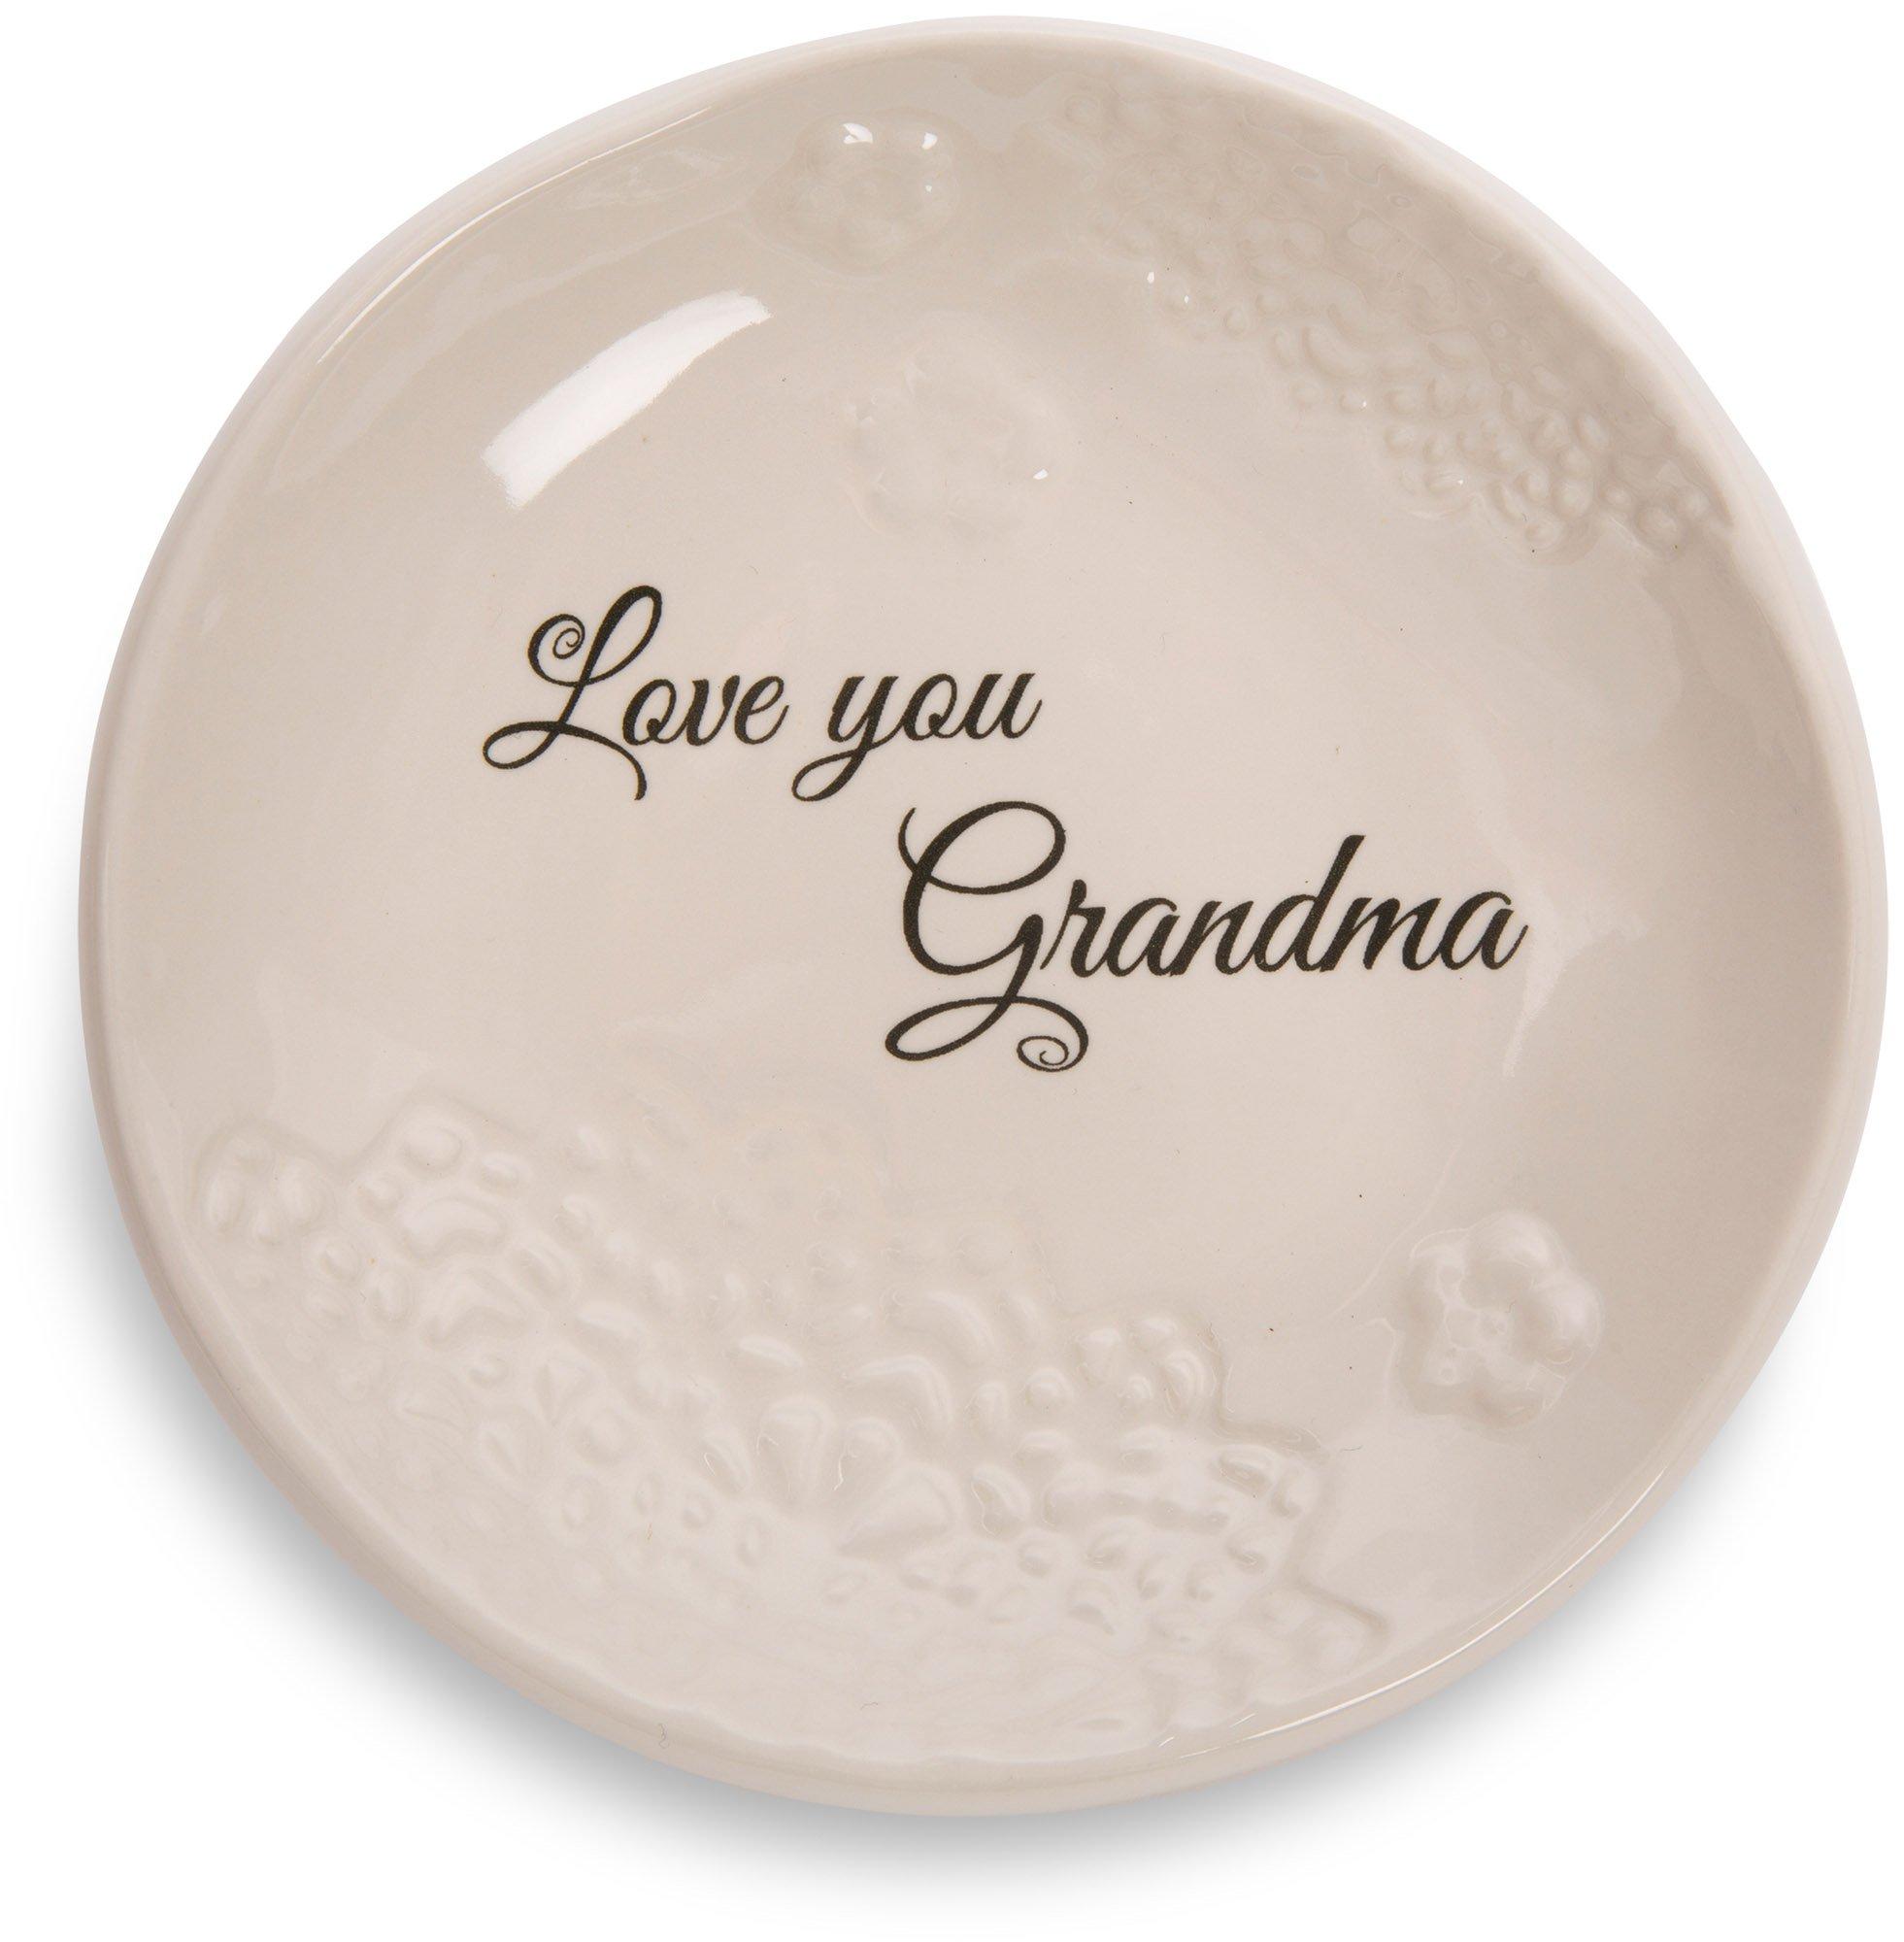 Pavilion Gift Company 19122 Light Your Way Everyday Love You Grandma Decorative Ceramic Plate, 5''